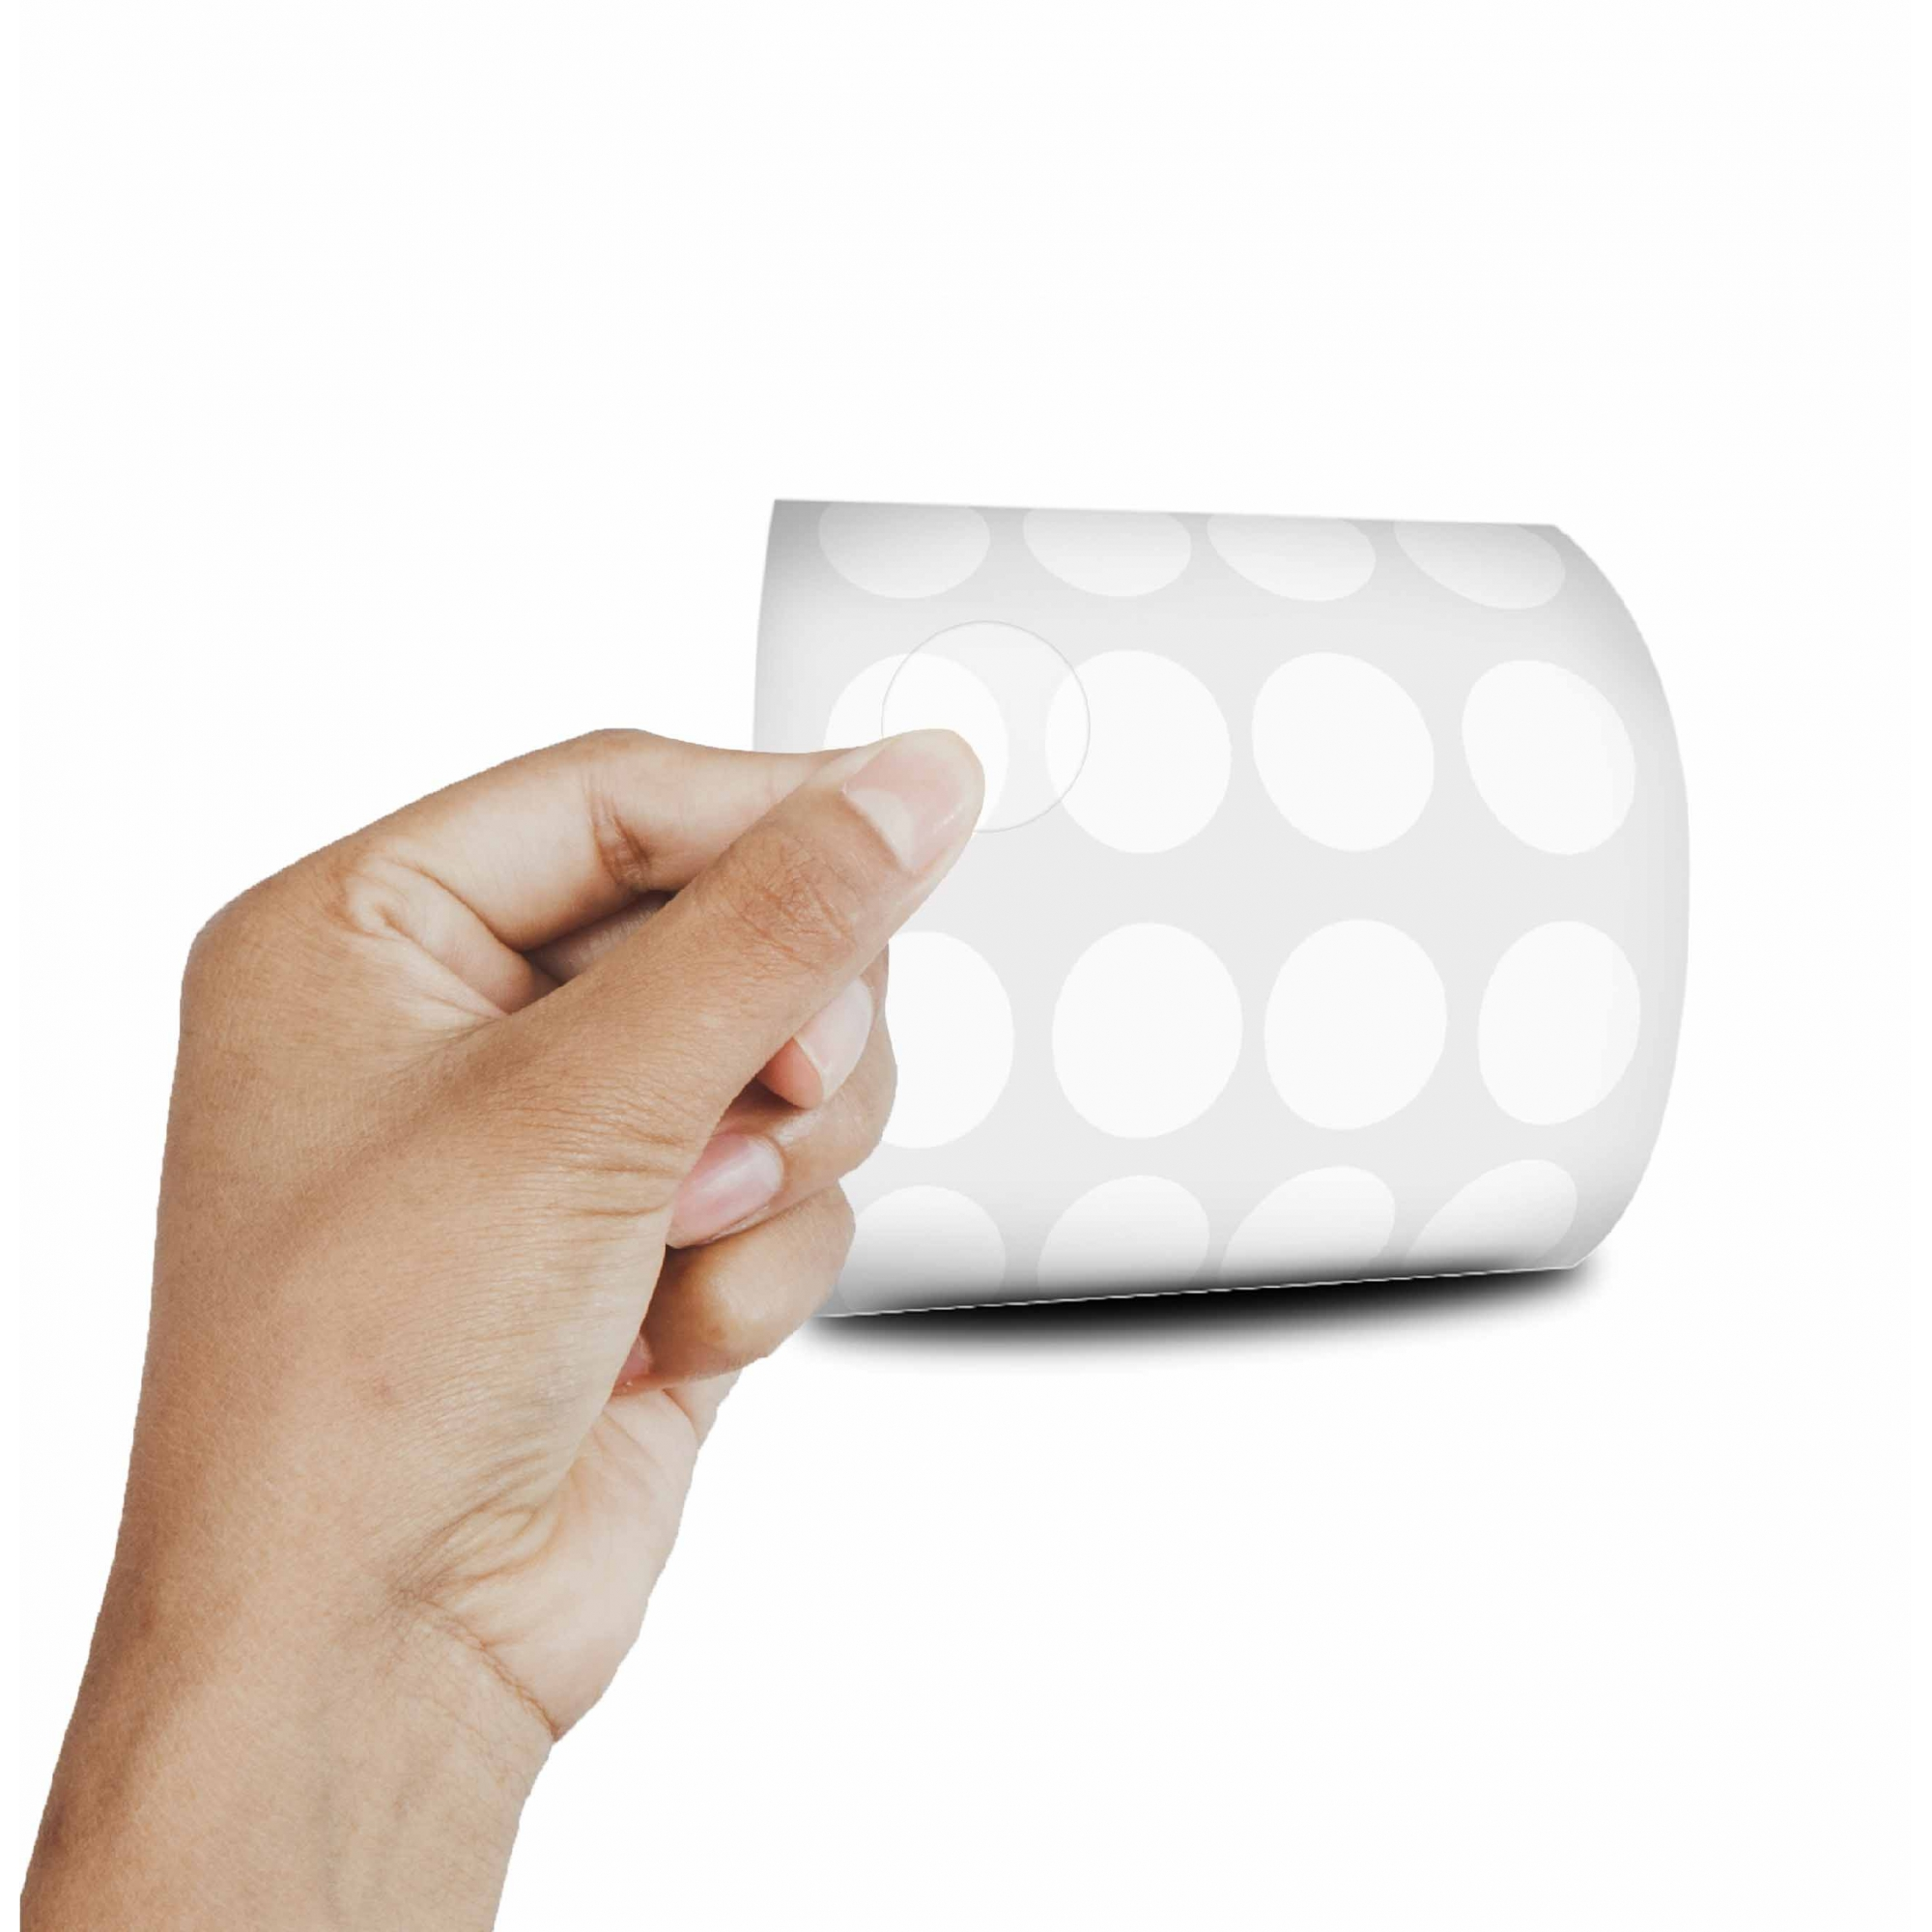 Etiqueta Redonda - Etiquetas Adesivas Bolinha Transparente 1,2 cm